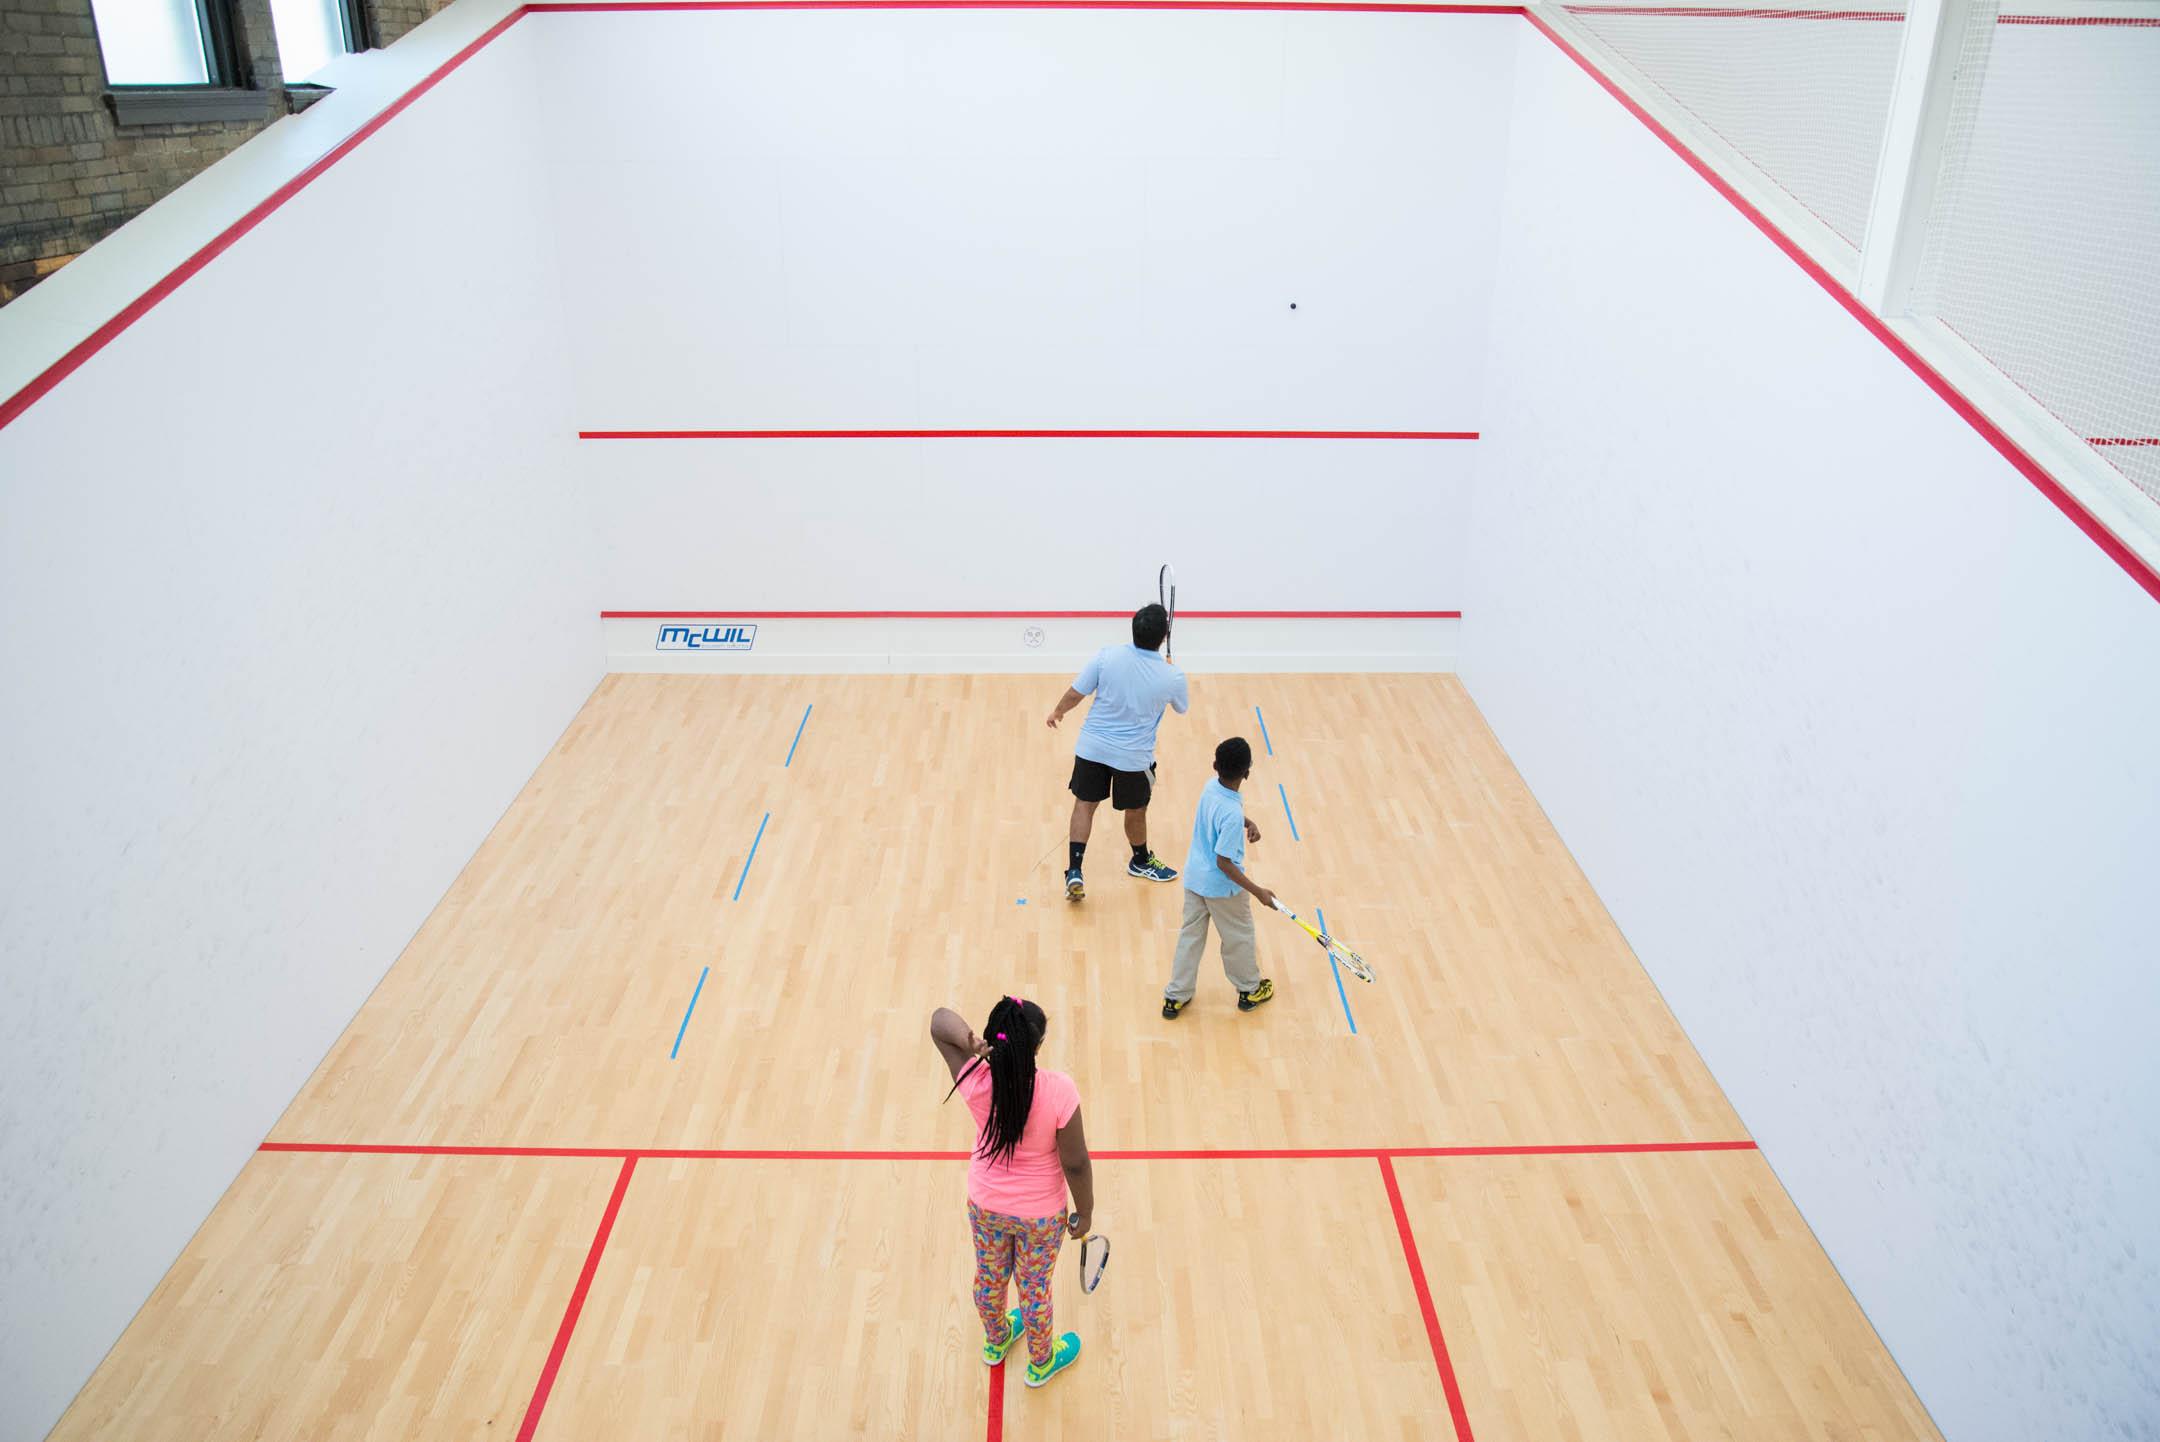 Vir Seth, squash director of the Cincinnati Squash Academy, runs drills with his kids at the Cincinnati Squash Academy Monday May 8, 2017.